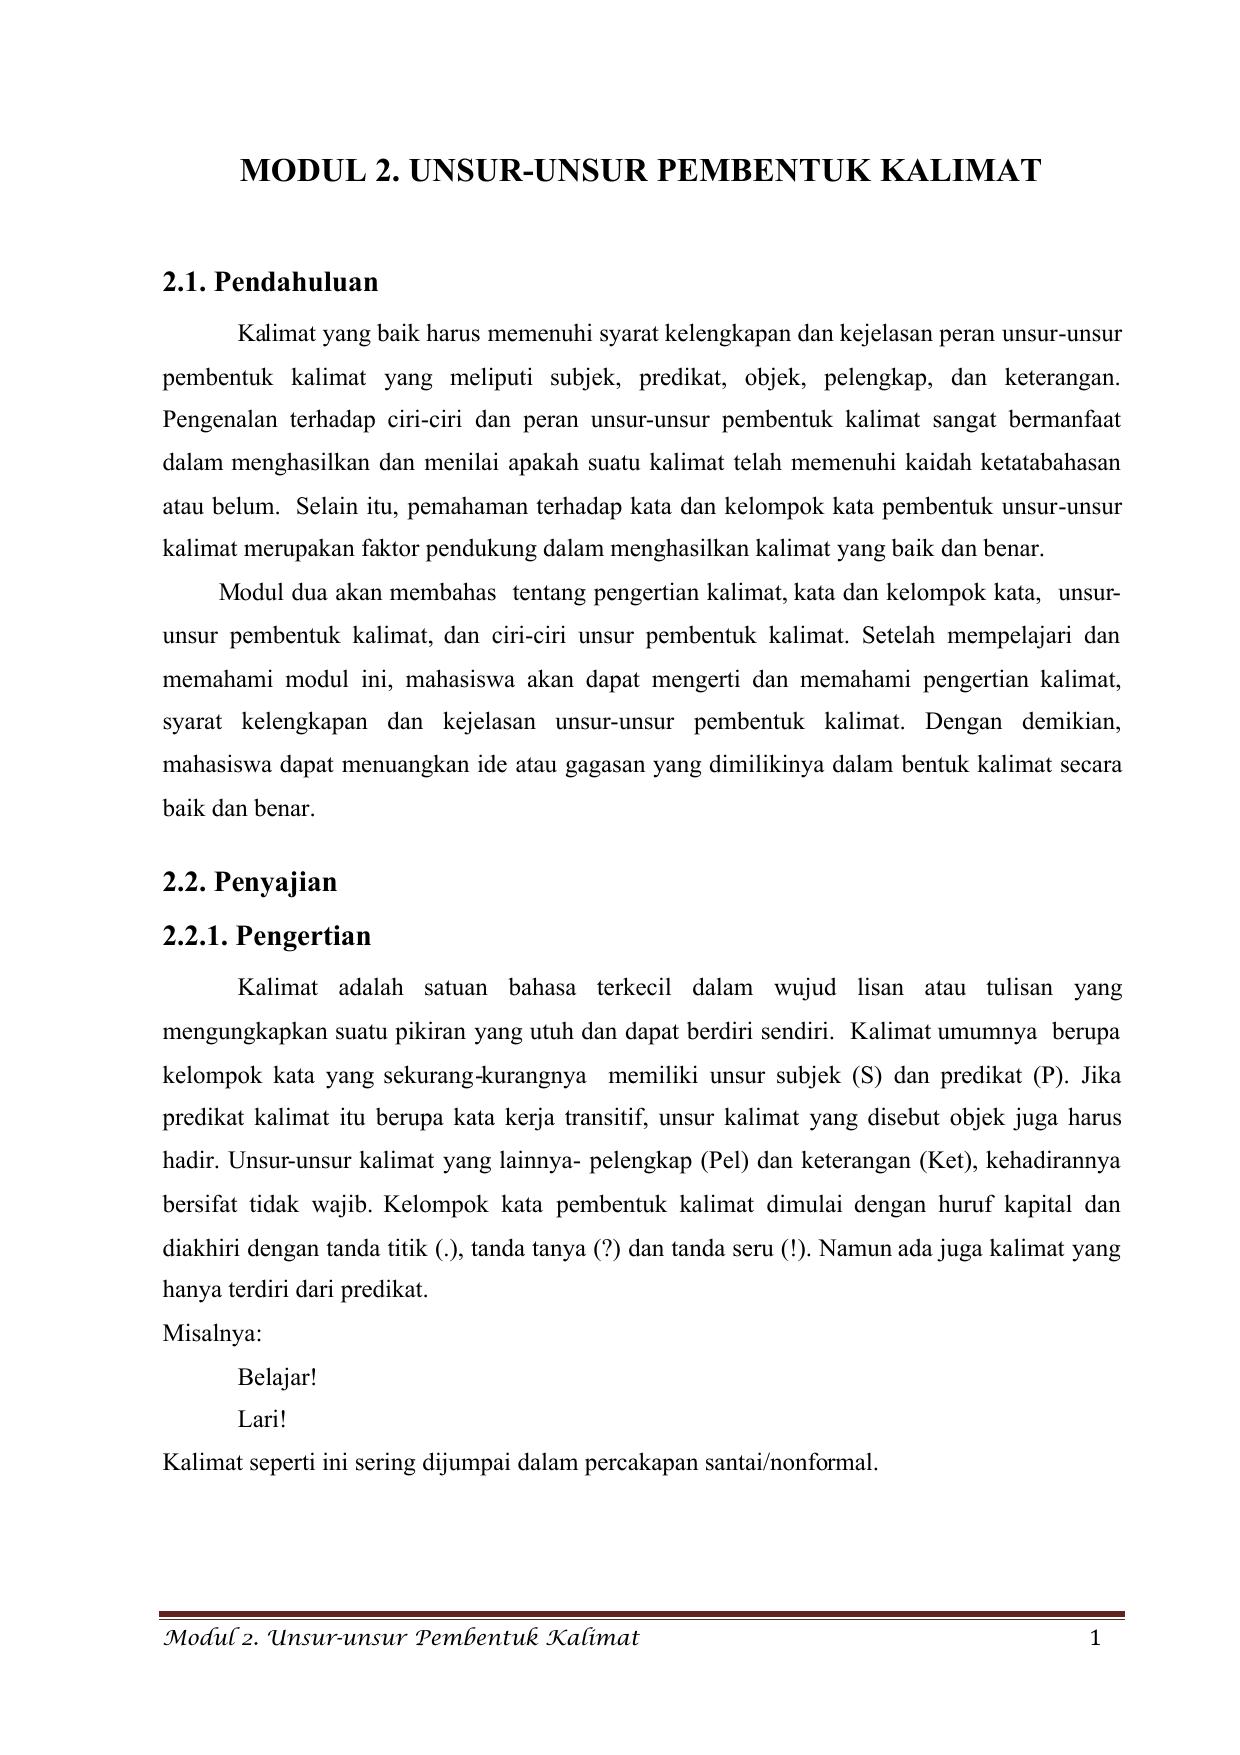 Modul 2 Unsur Unsur Pembentuk Kalimat